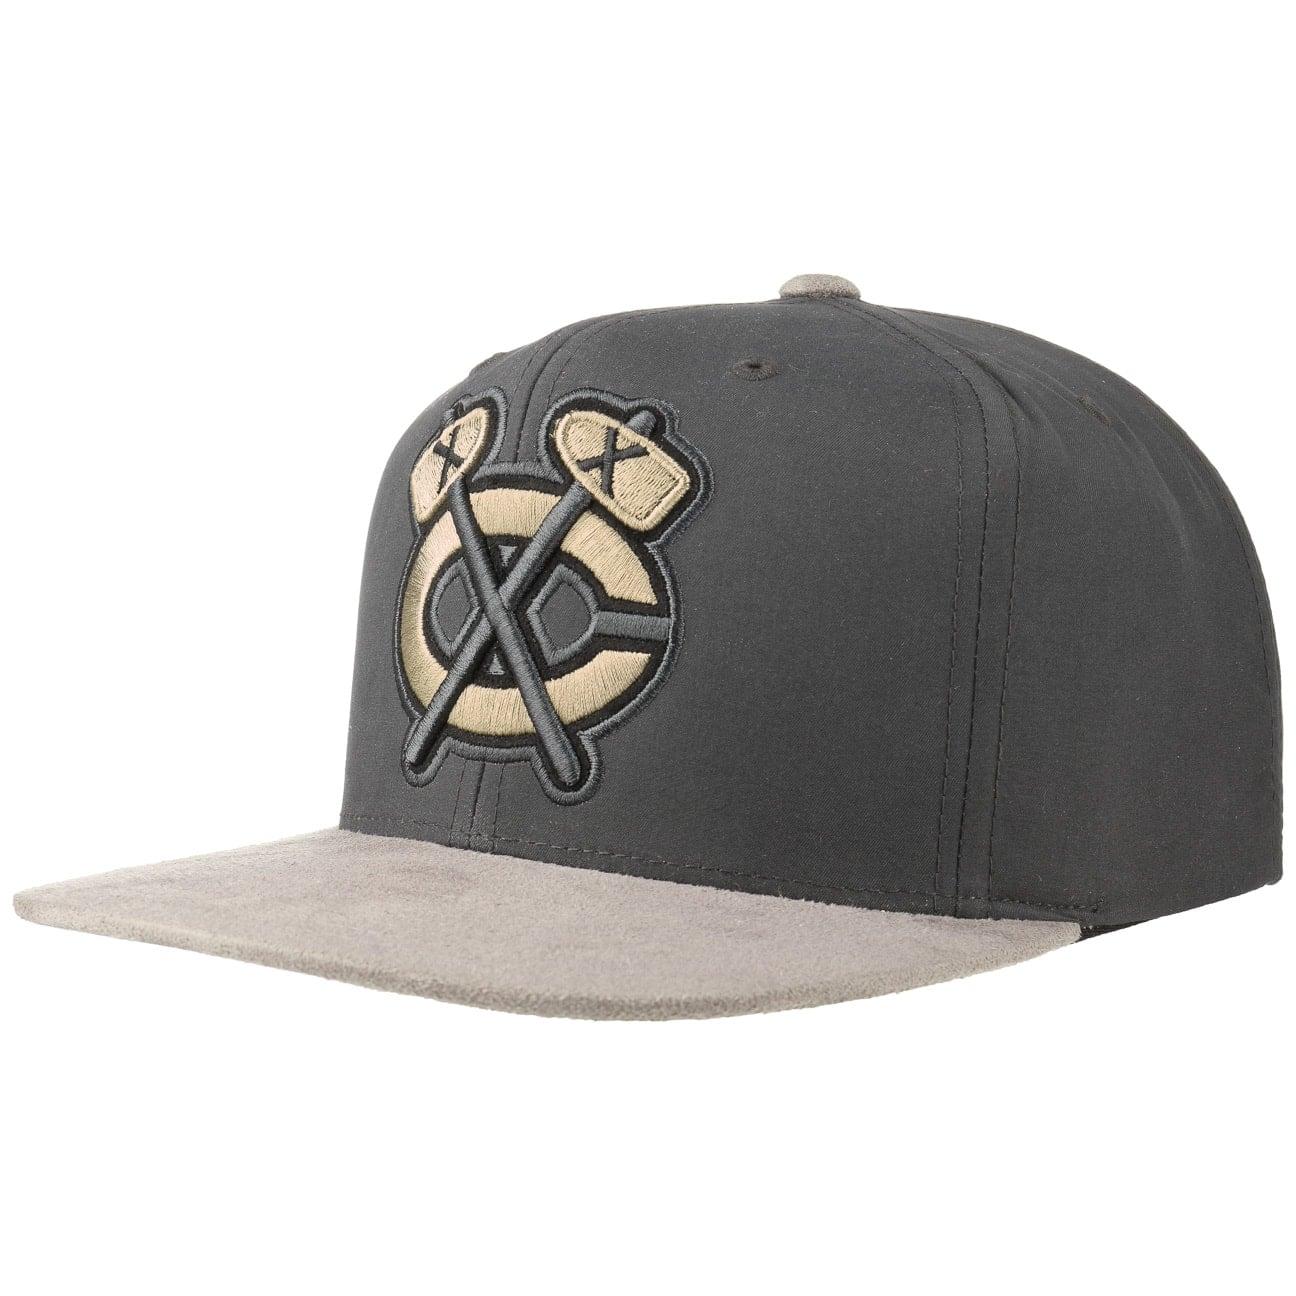 Gorra Blackhawks by Mitchell & Ness  gorra de baseball